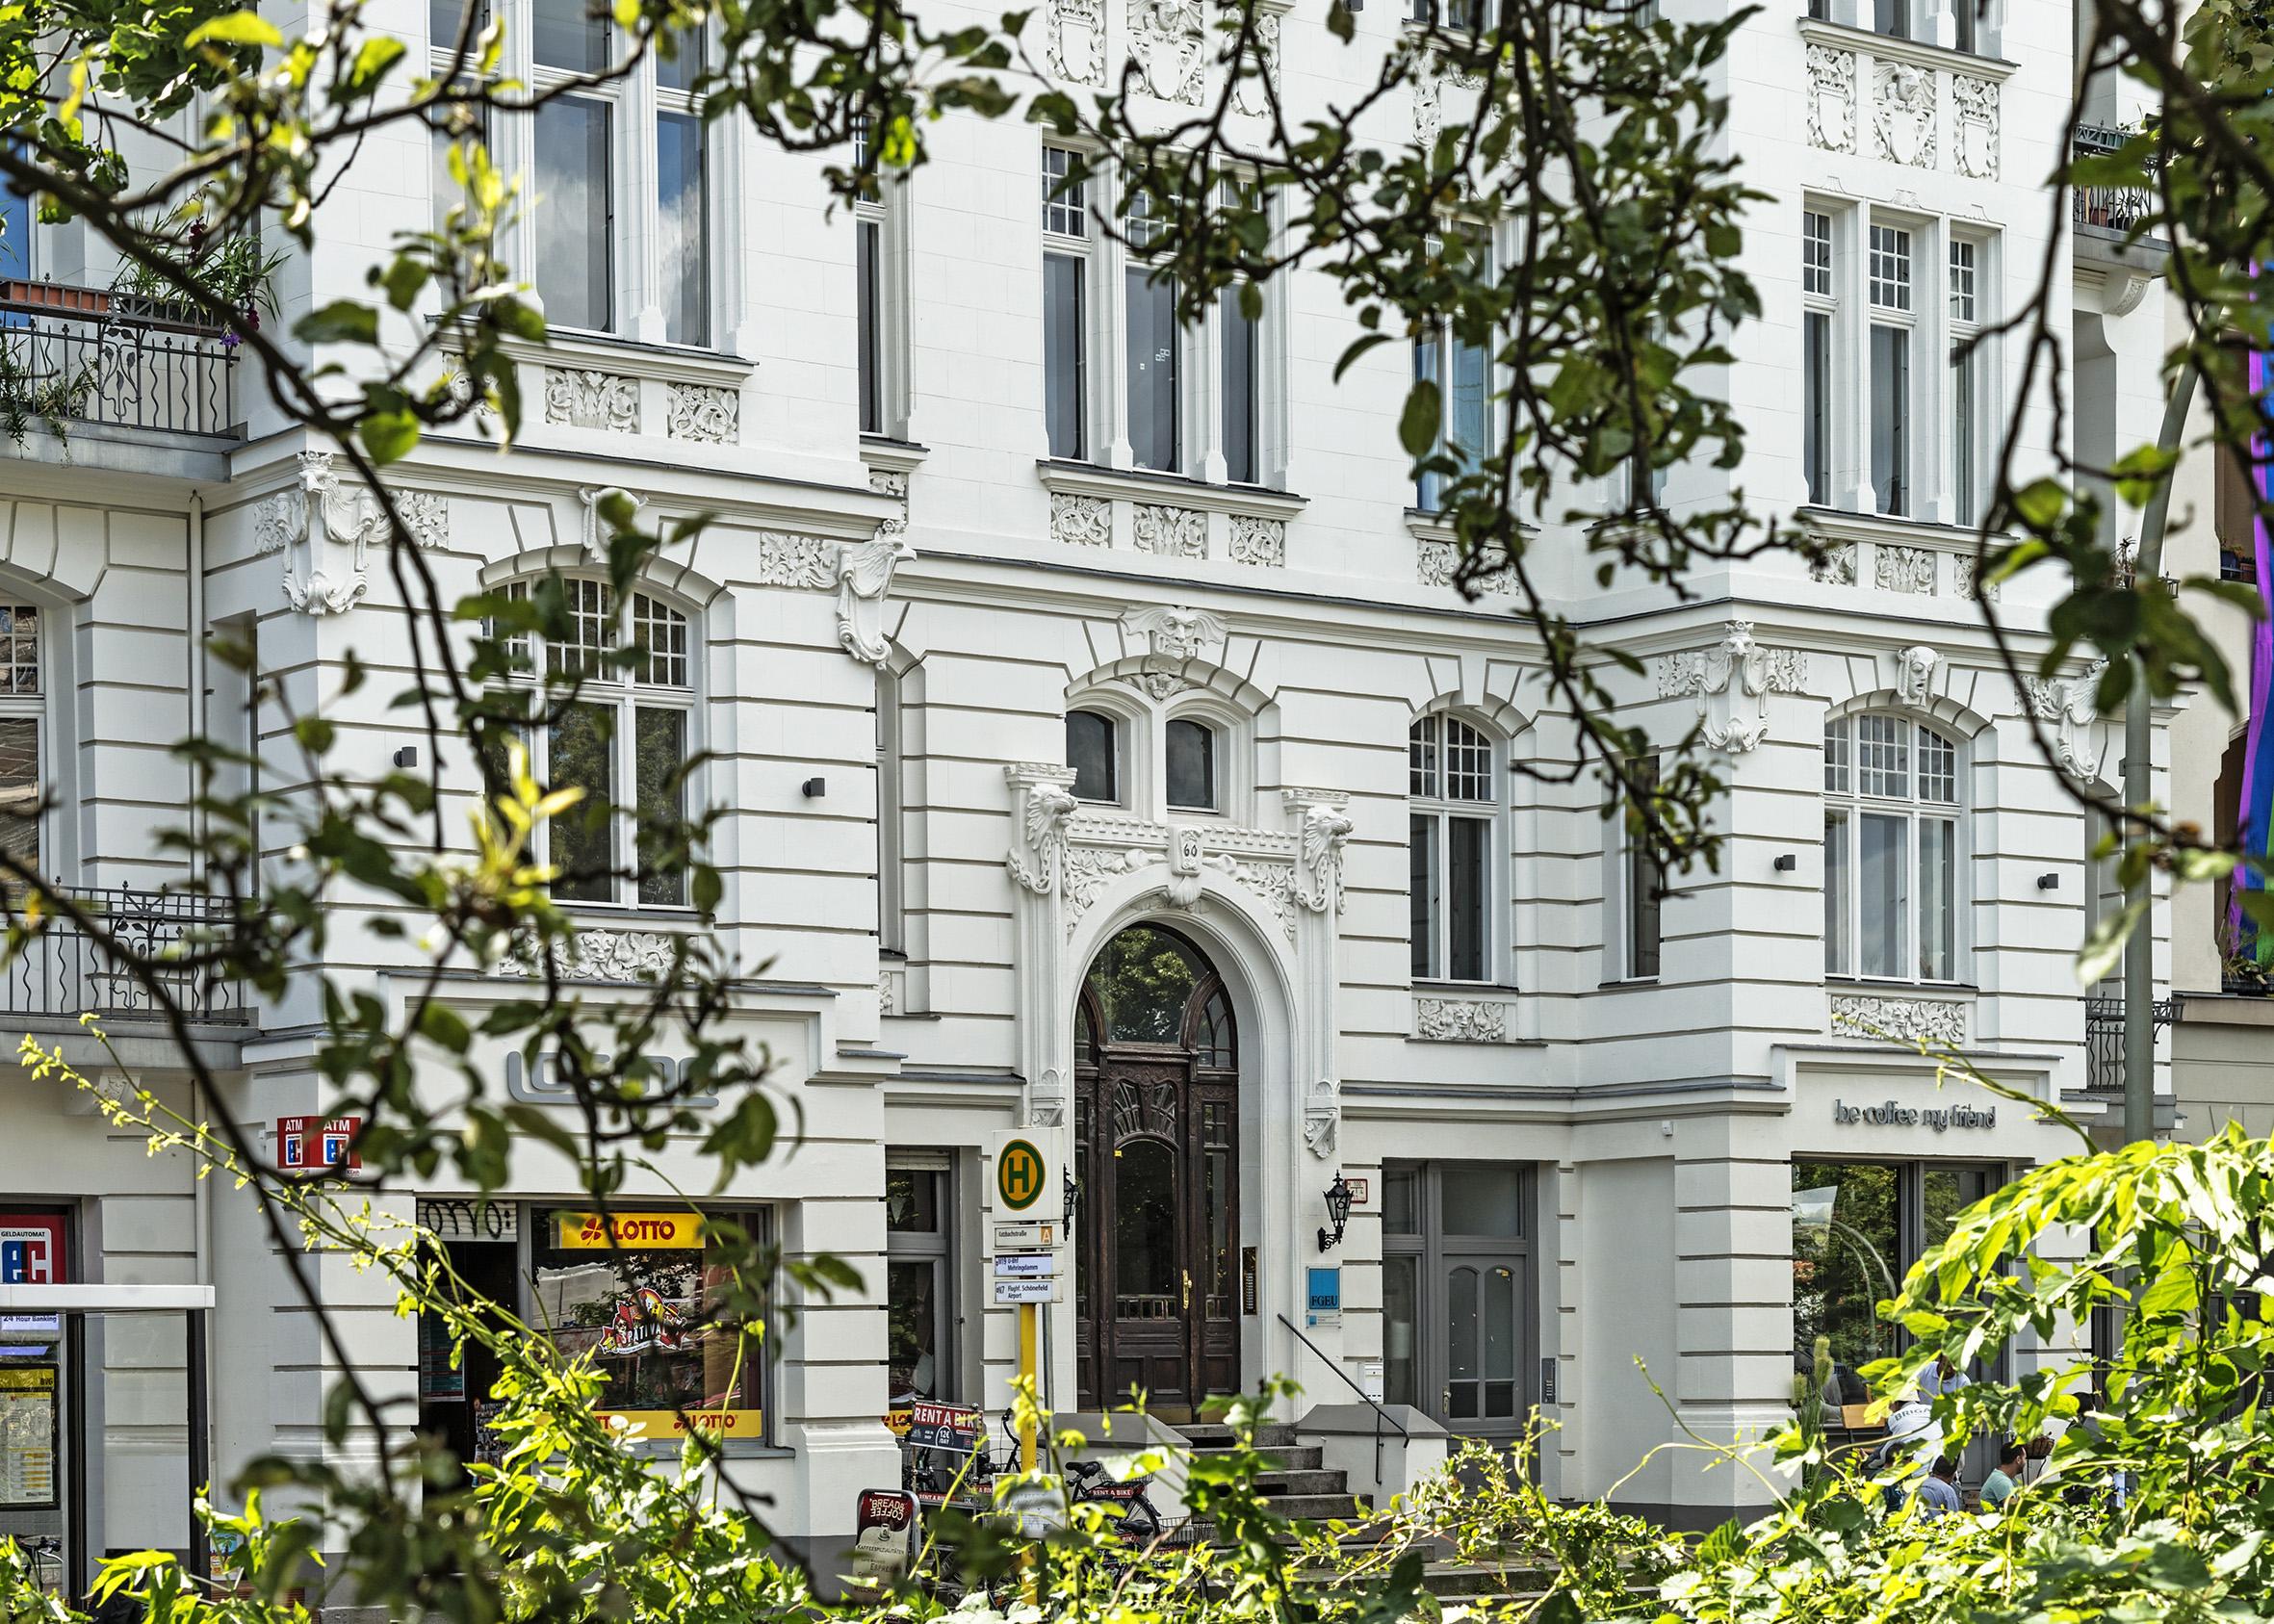 Yorckstrasse-60-2722